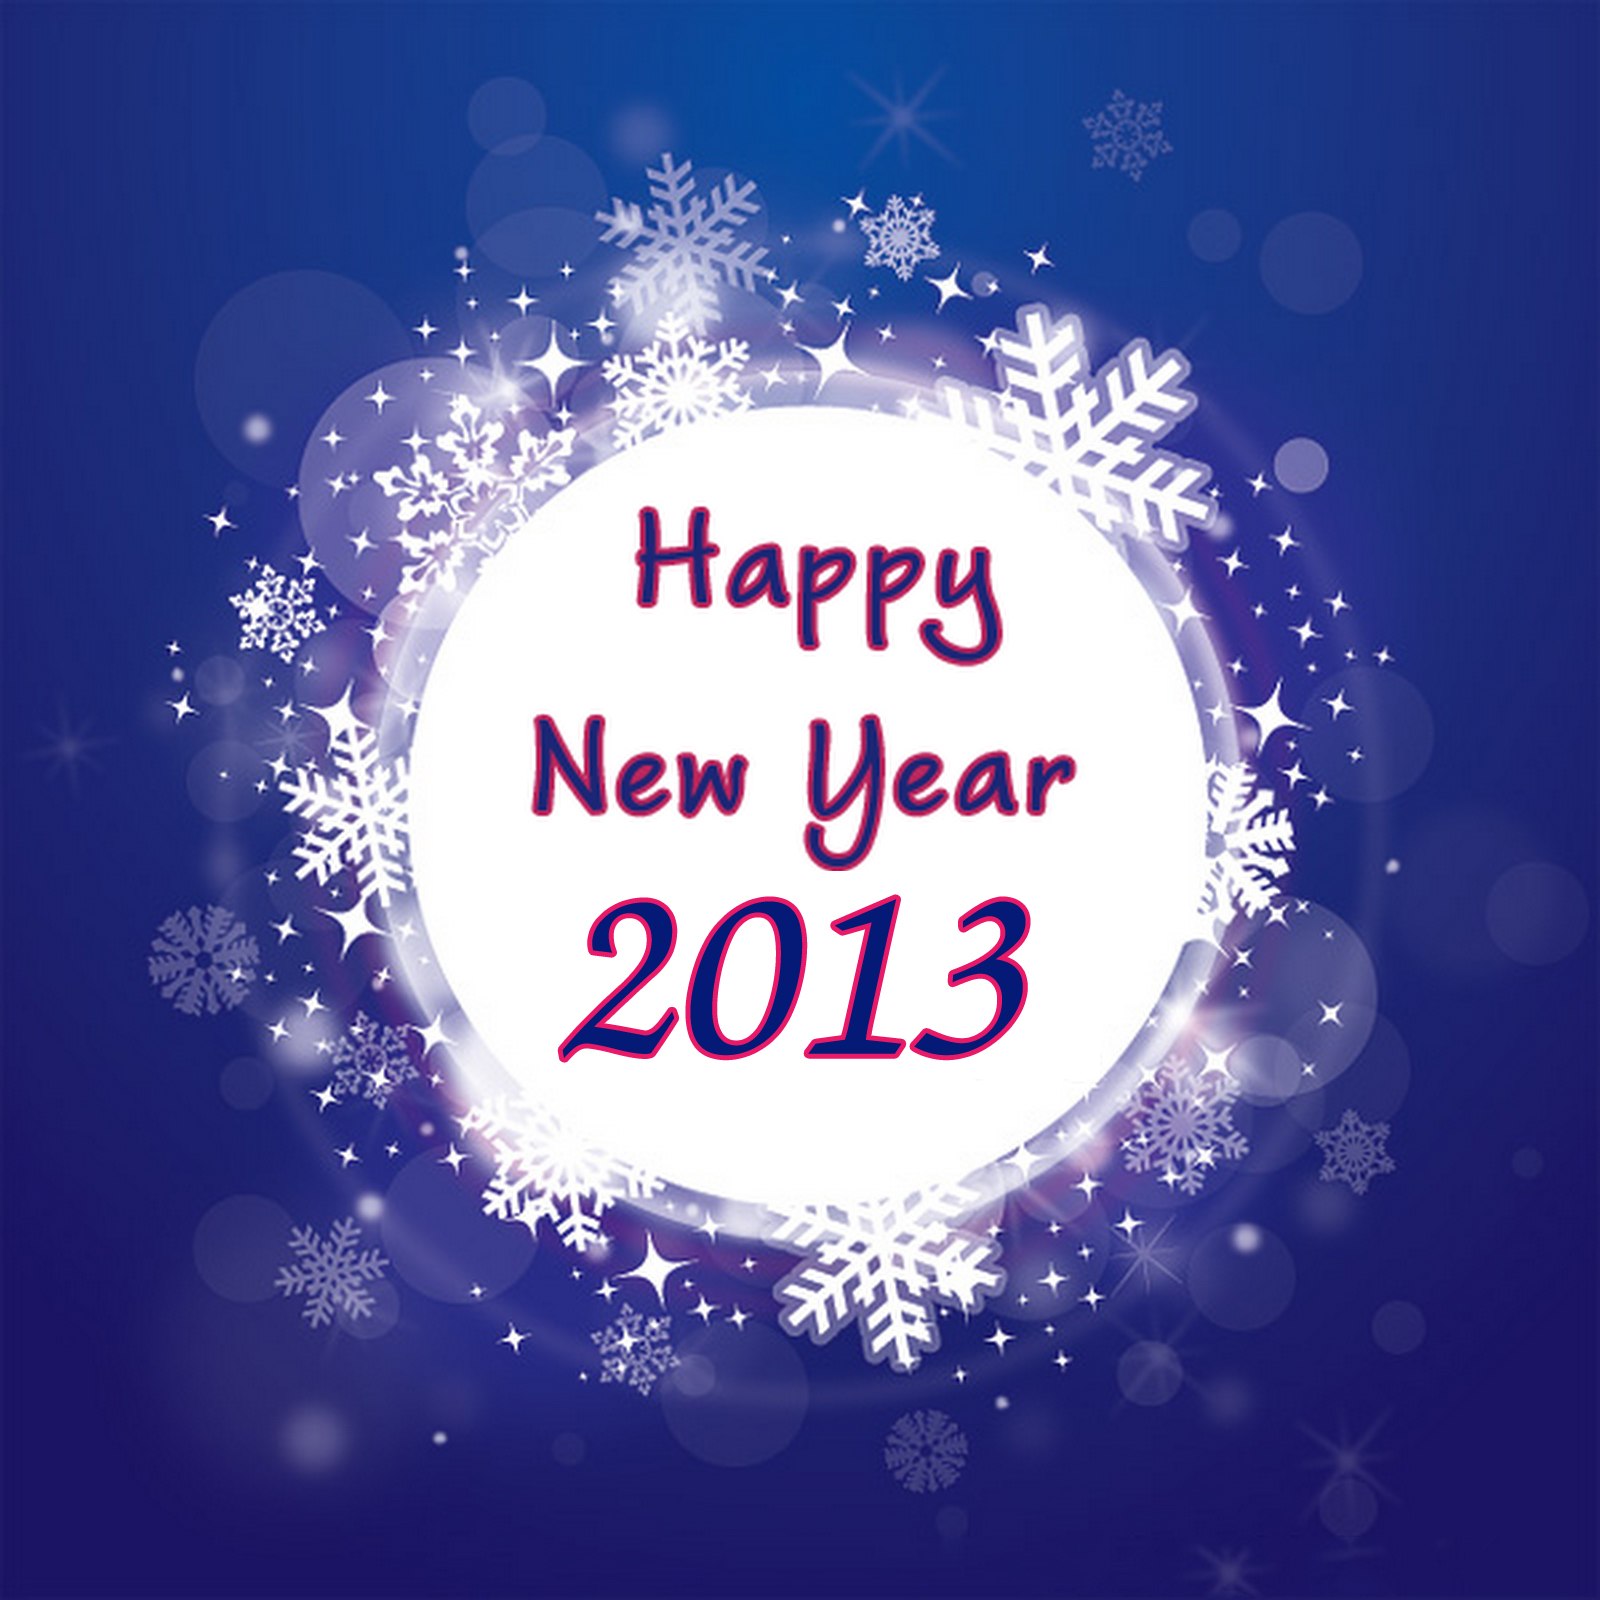 happy new year 2013 - photo #8